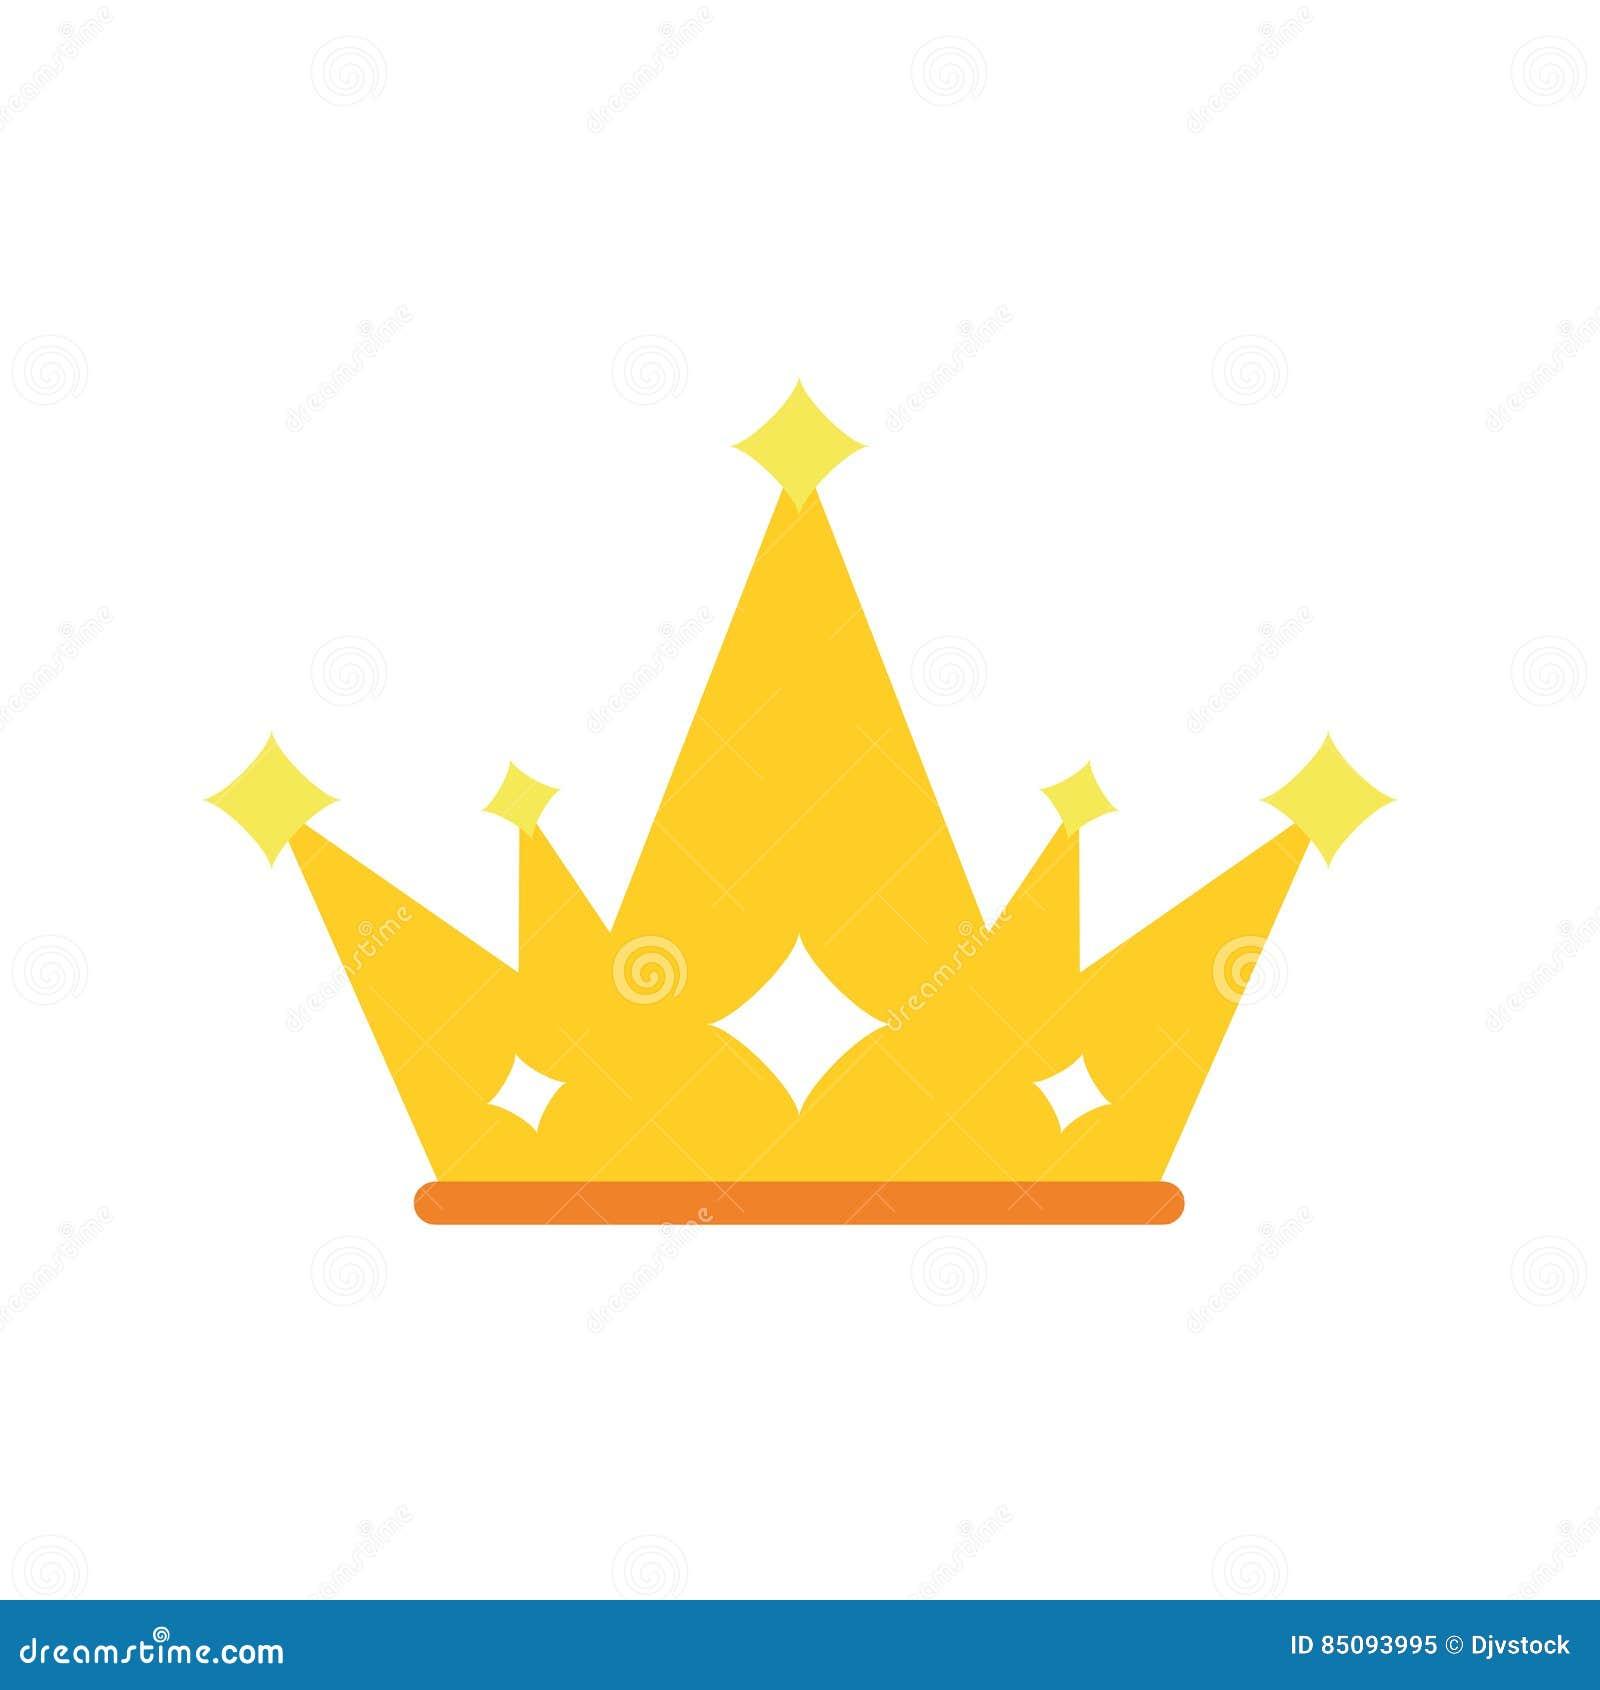 Crown Royal Symbol Stock Illustration - Image: 85093995